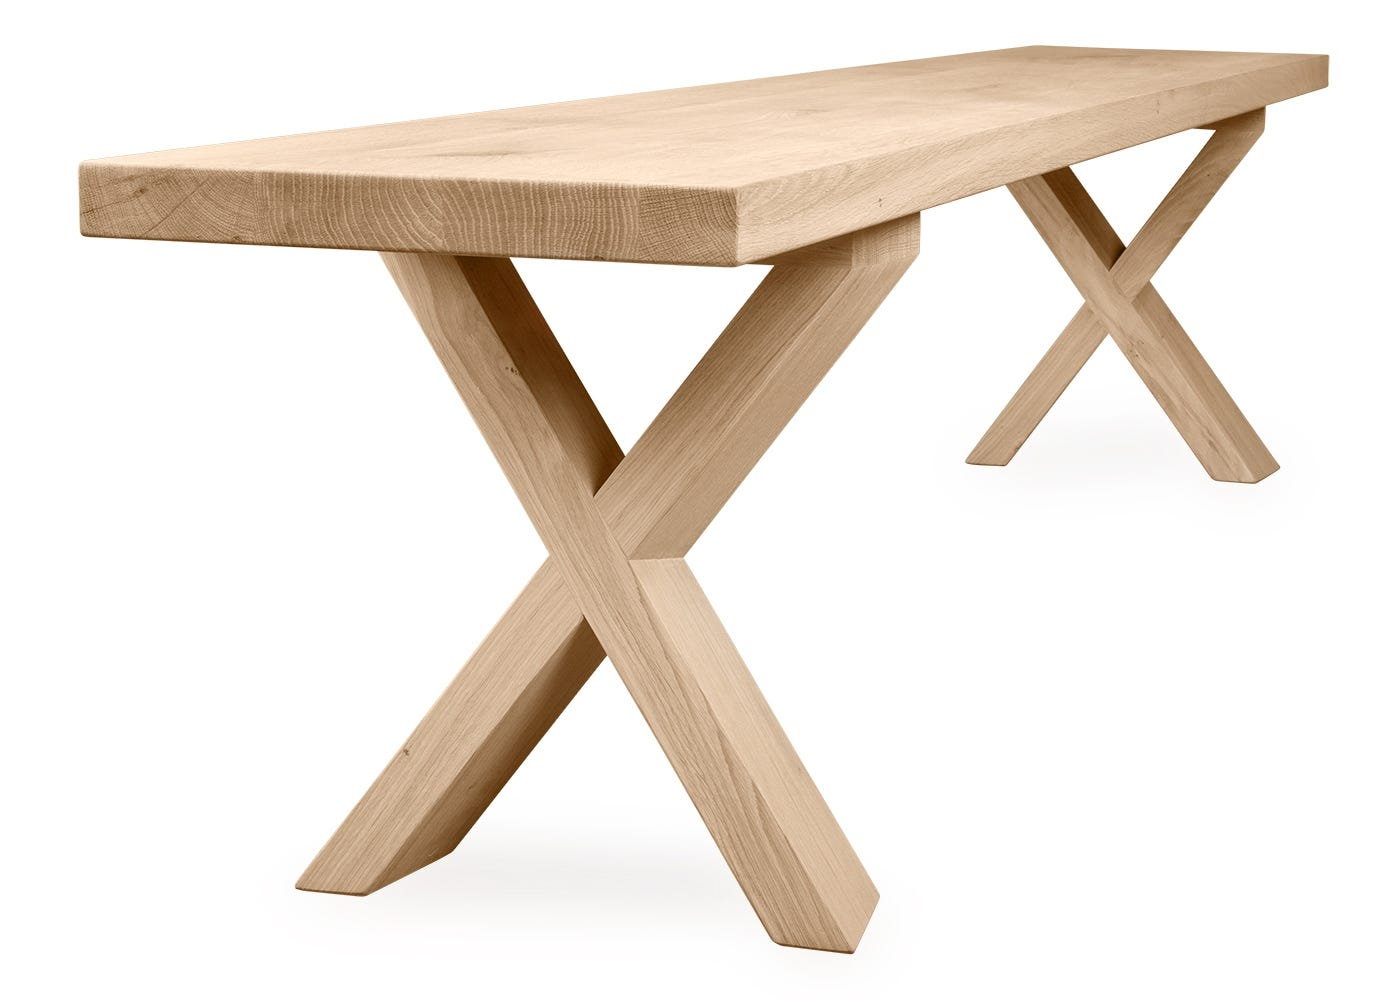 The Oslo bench has a criss-cross base.